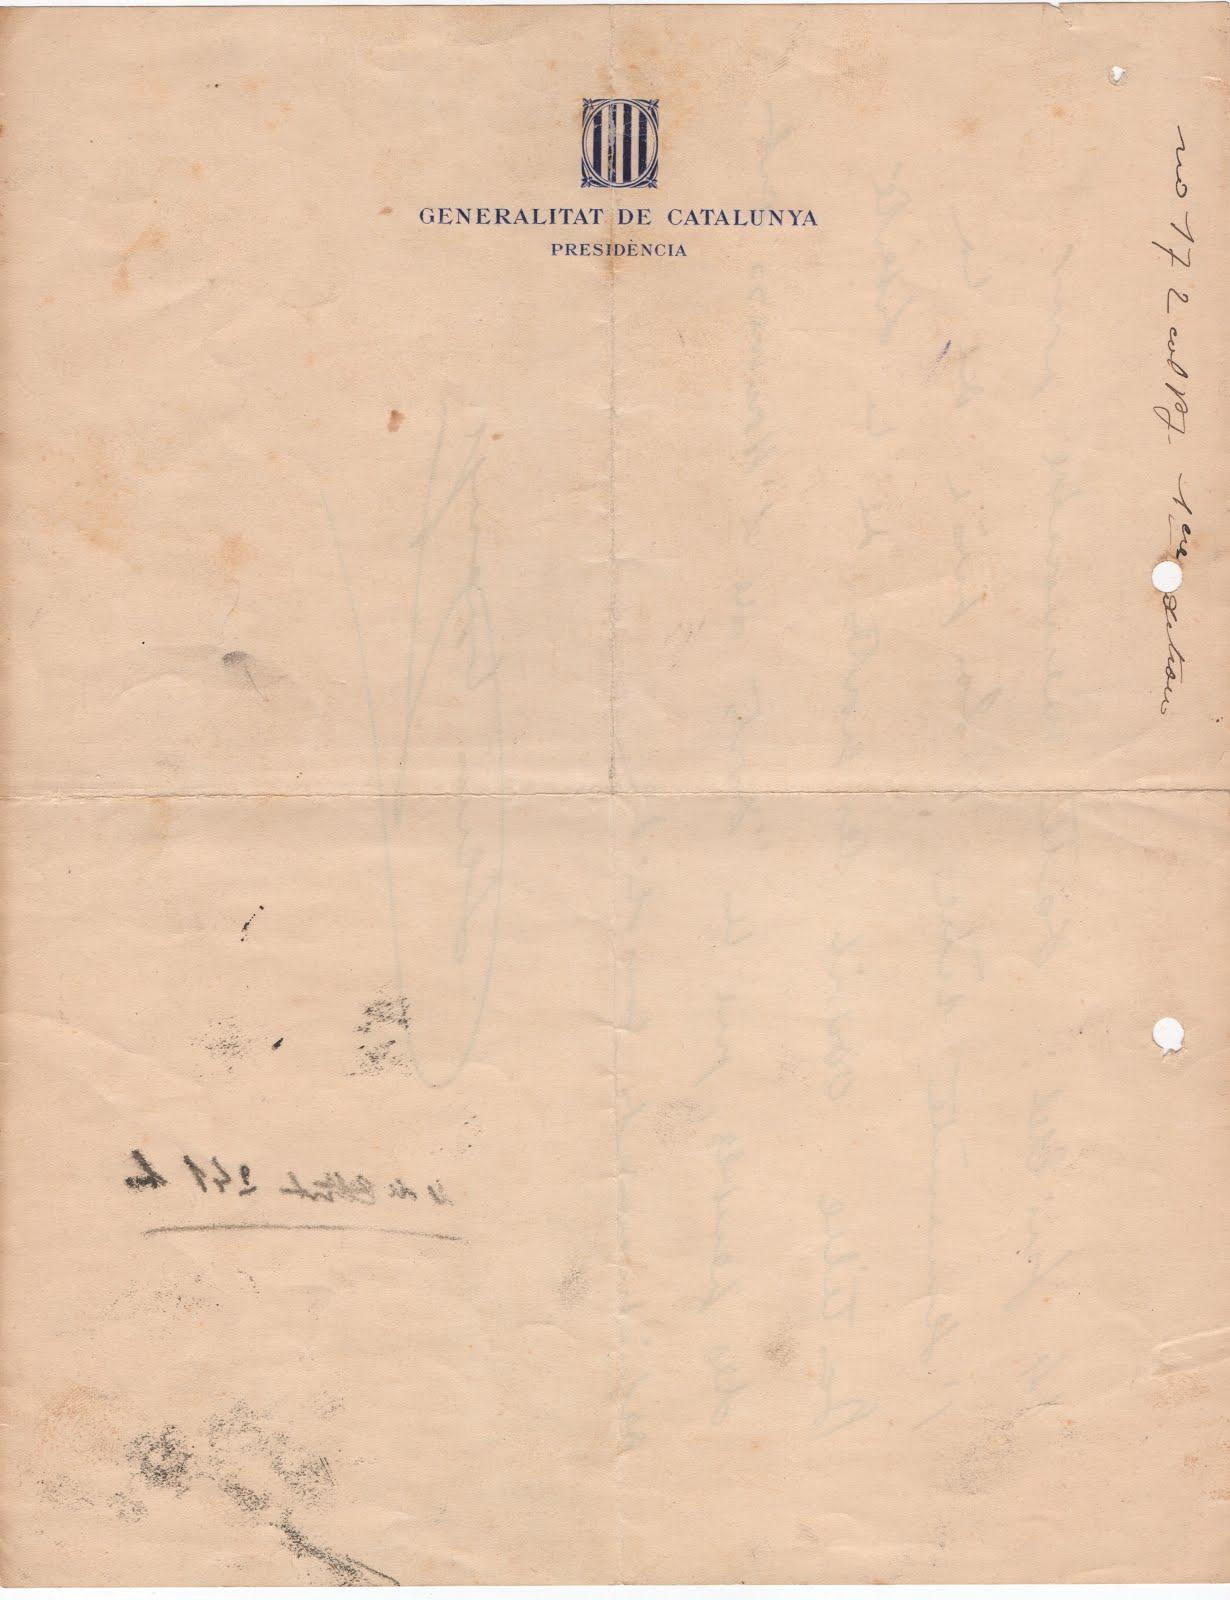 Document President Lluís Companys